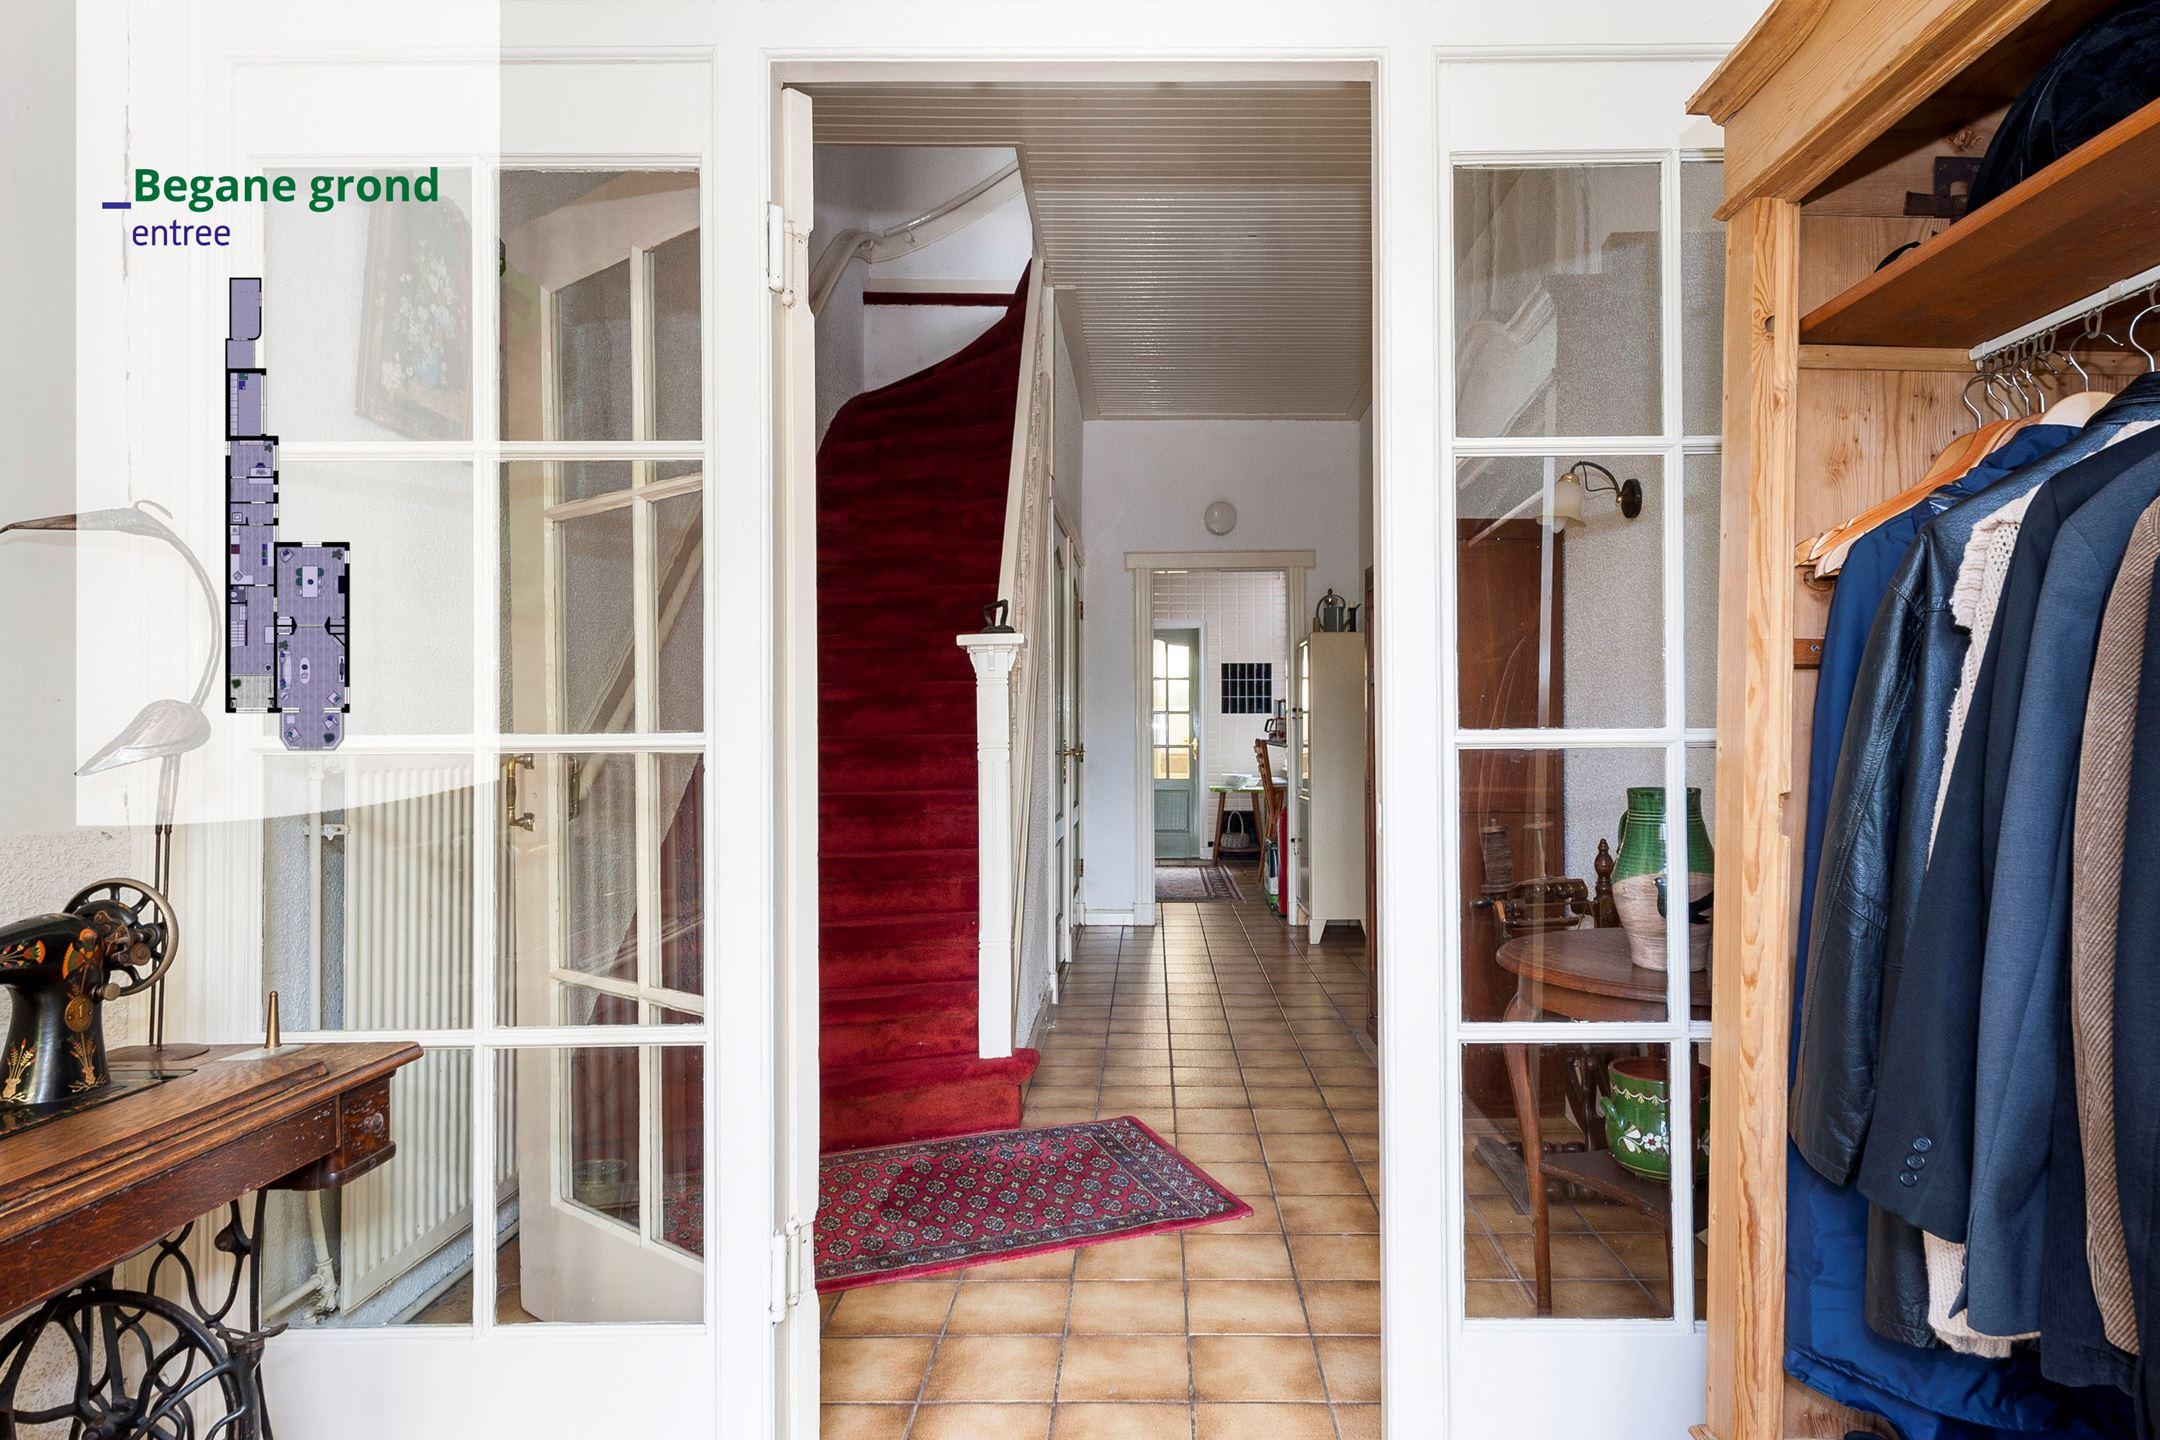 Gekleurde Eyecather Huis : Huis te koop sandtlaan ce rijnsburg funda